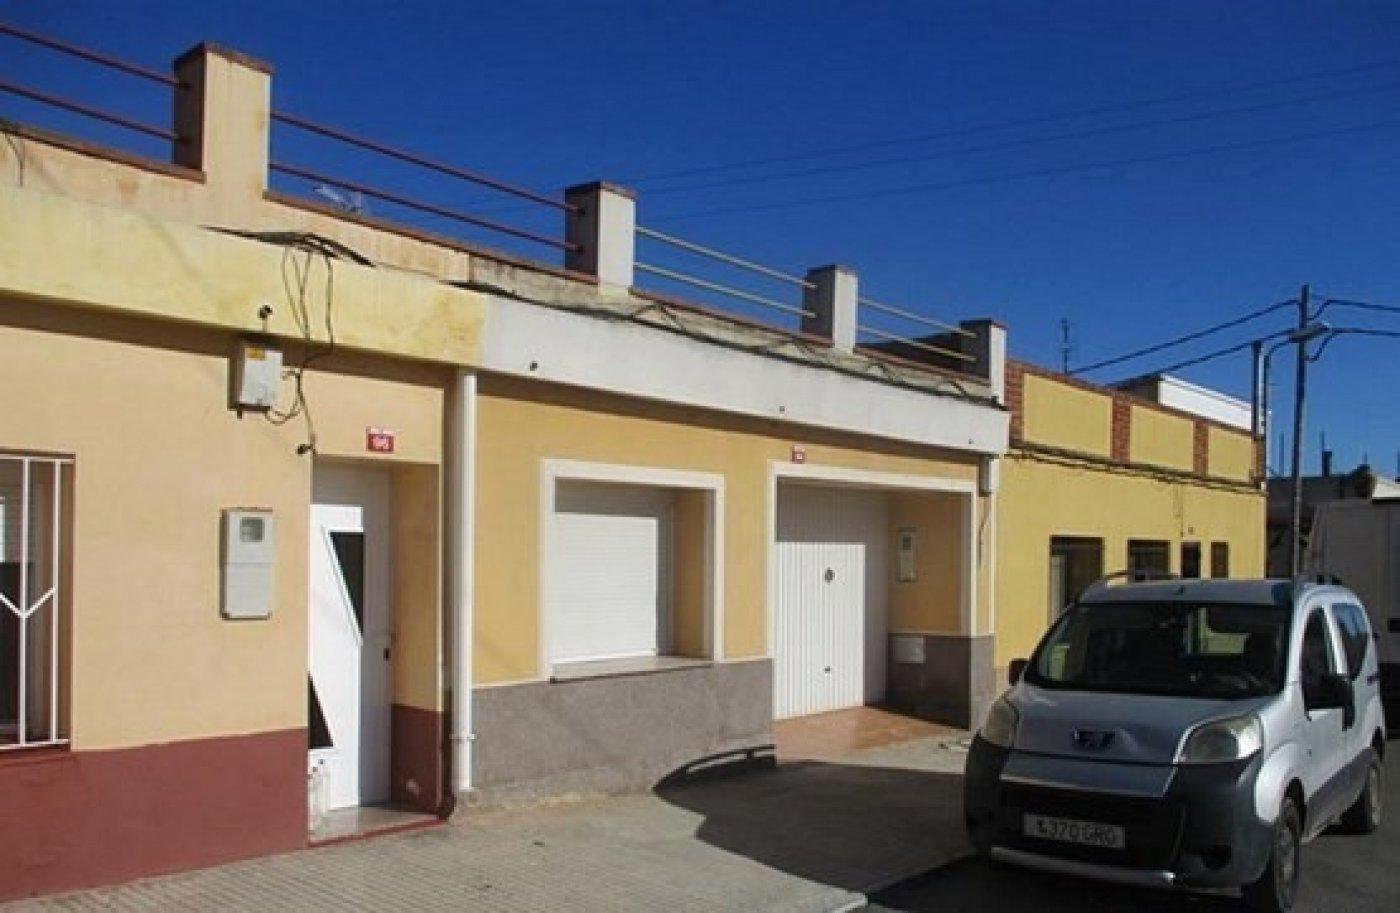 House for sale in Camarles, Camarles